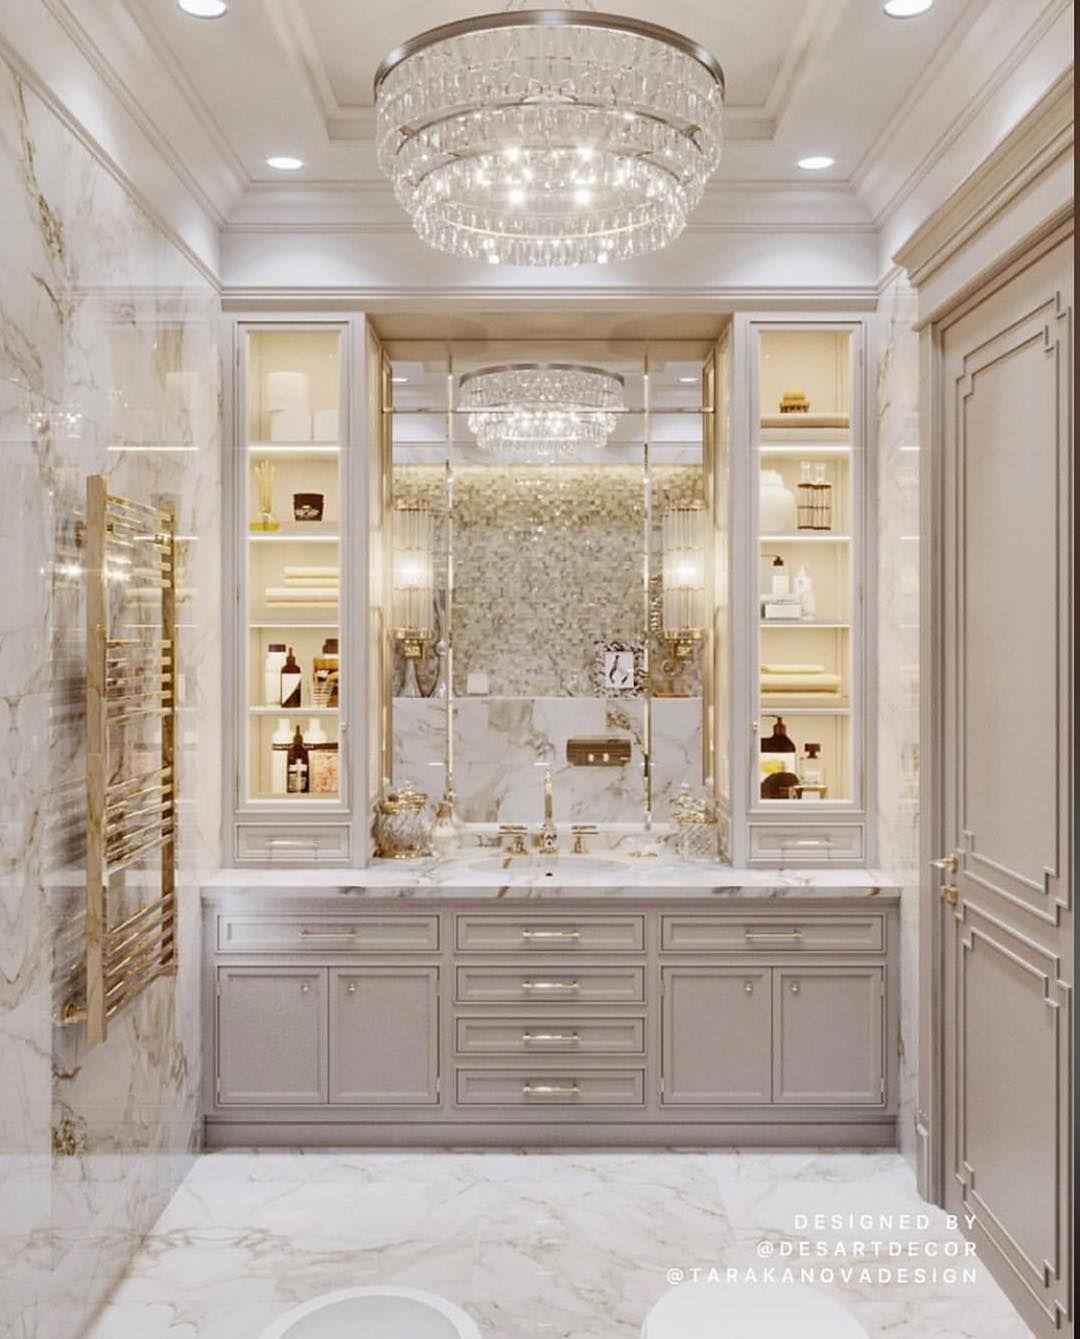 What a luxurious classic powder room ???? Follow @simplyuniquespace - - - By @desartdecor  #simplyuniquespace #bathroomdesign #modernpowderrooms